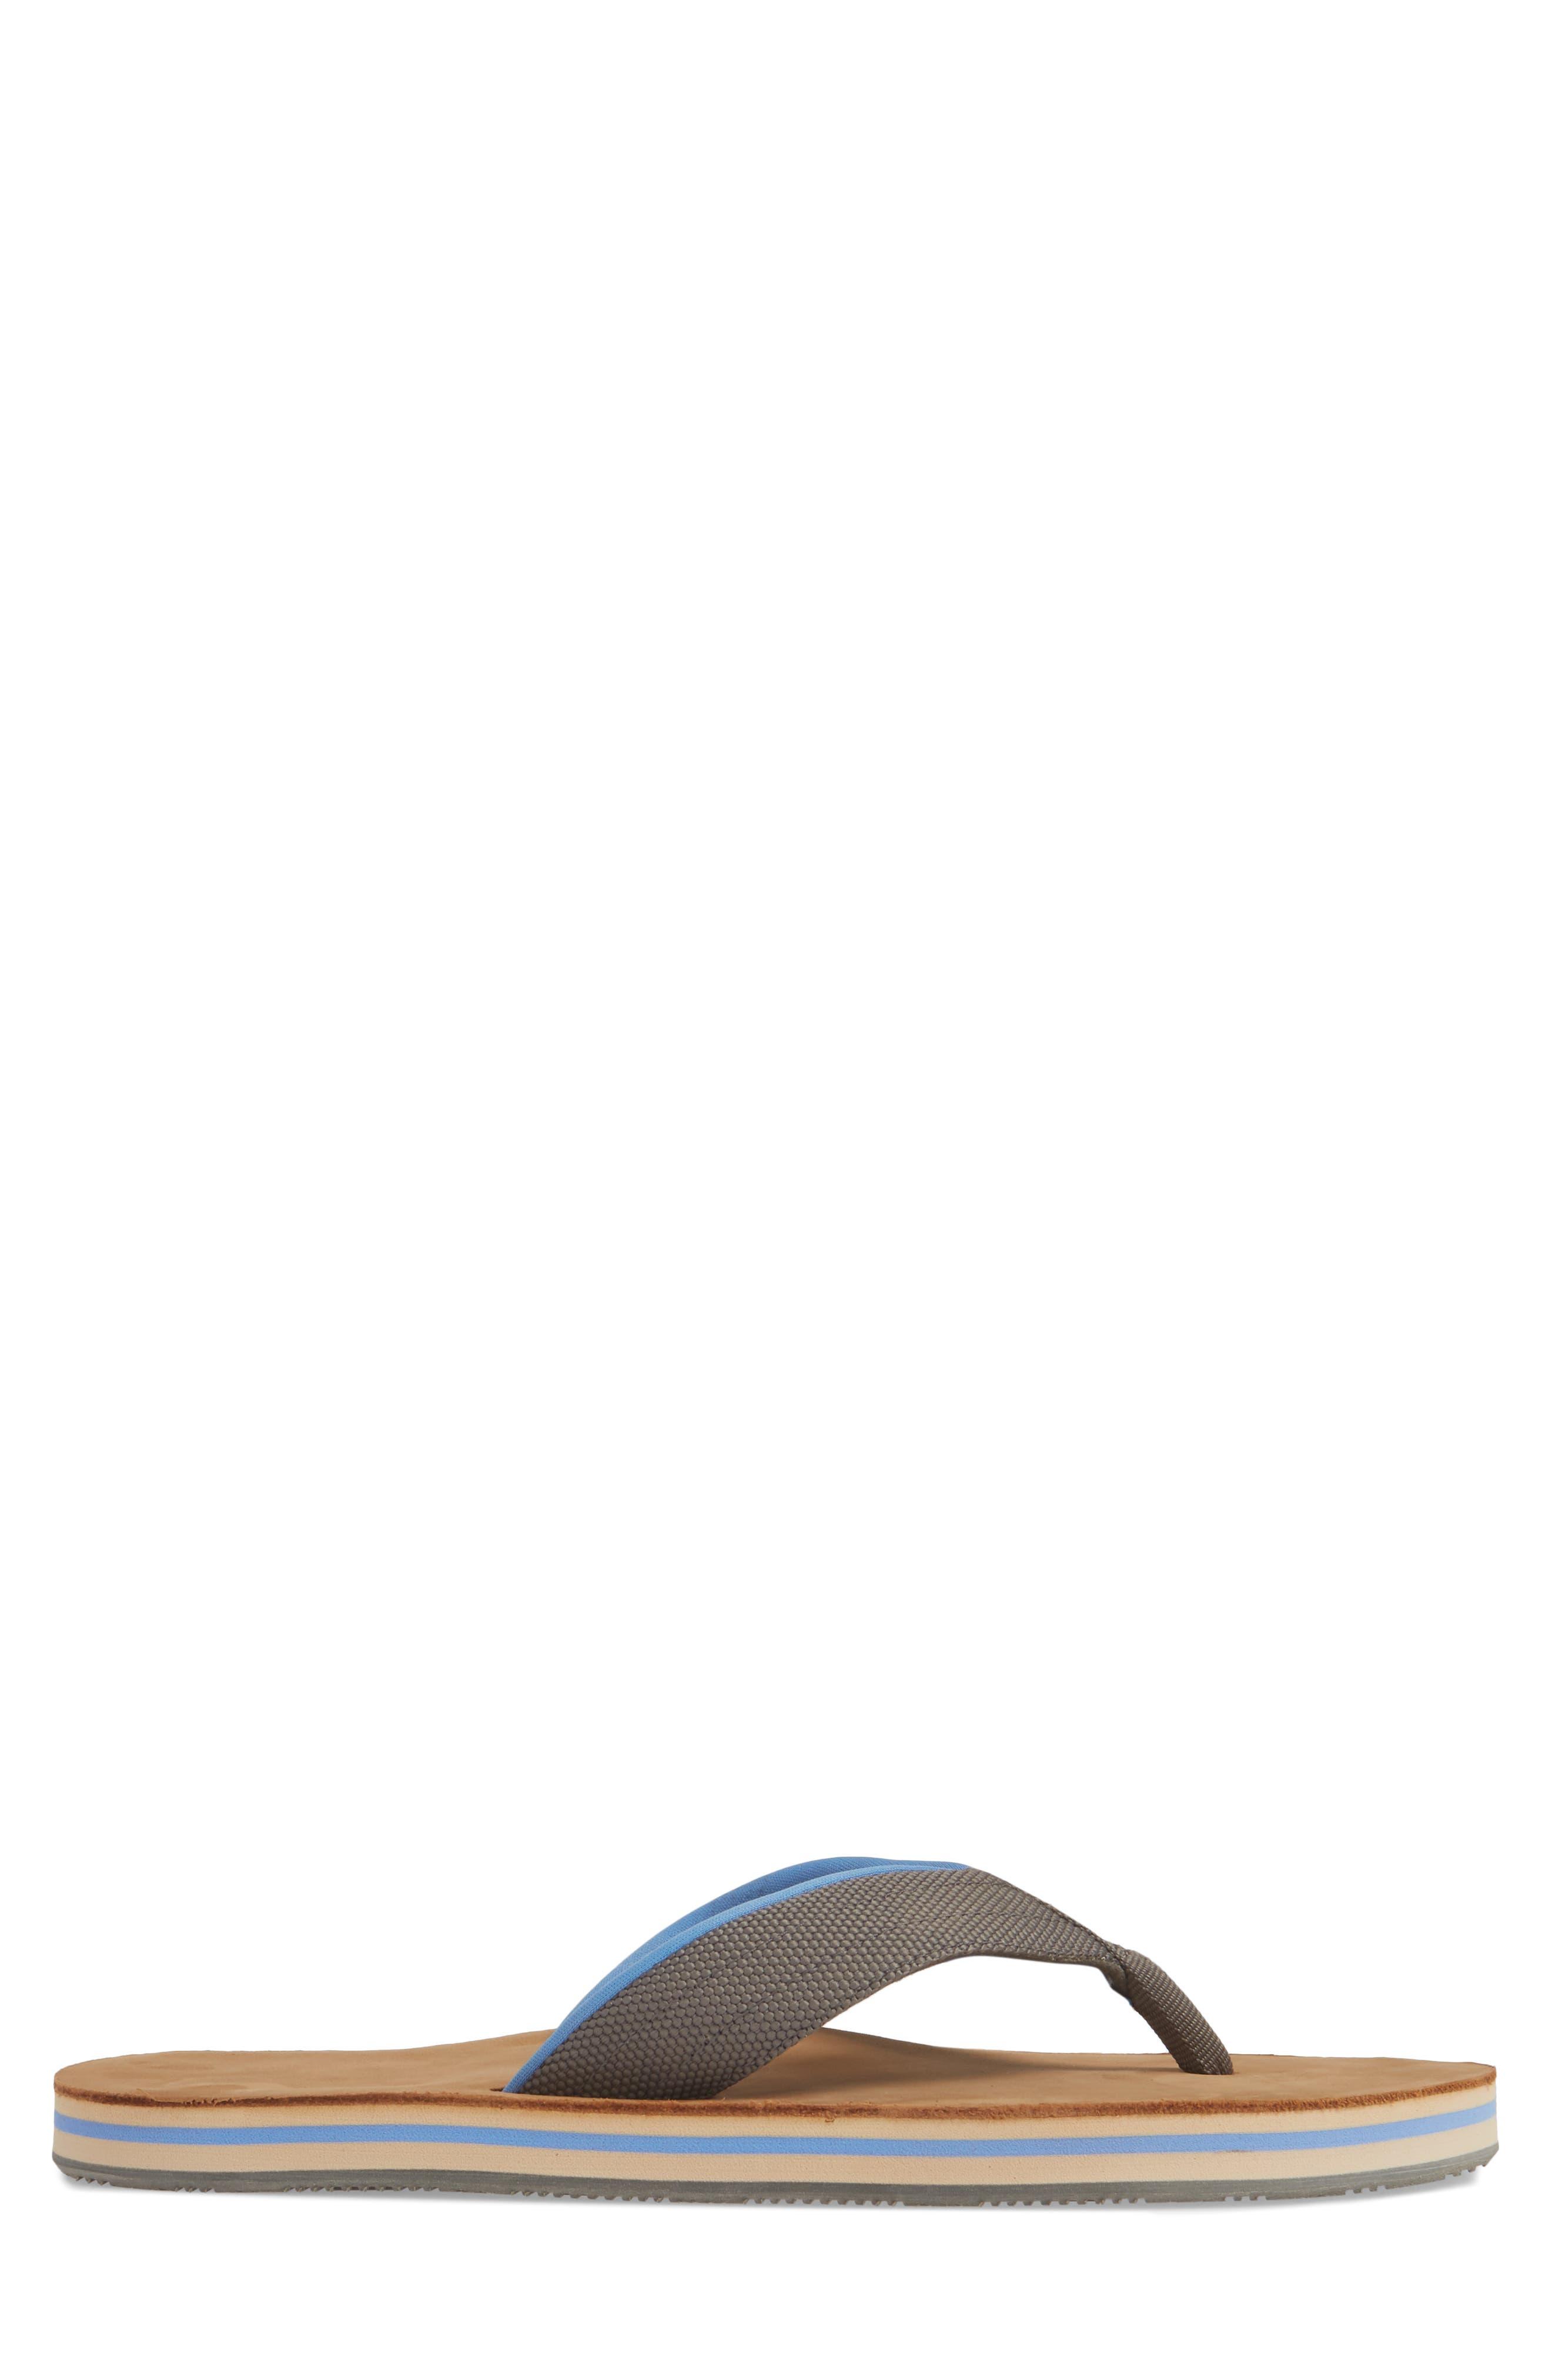 HARI MARI,                             'Scouts' Flip Flop,                             Alternate thumbnail 3, color,                             021